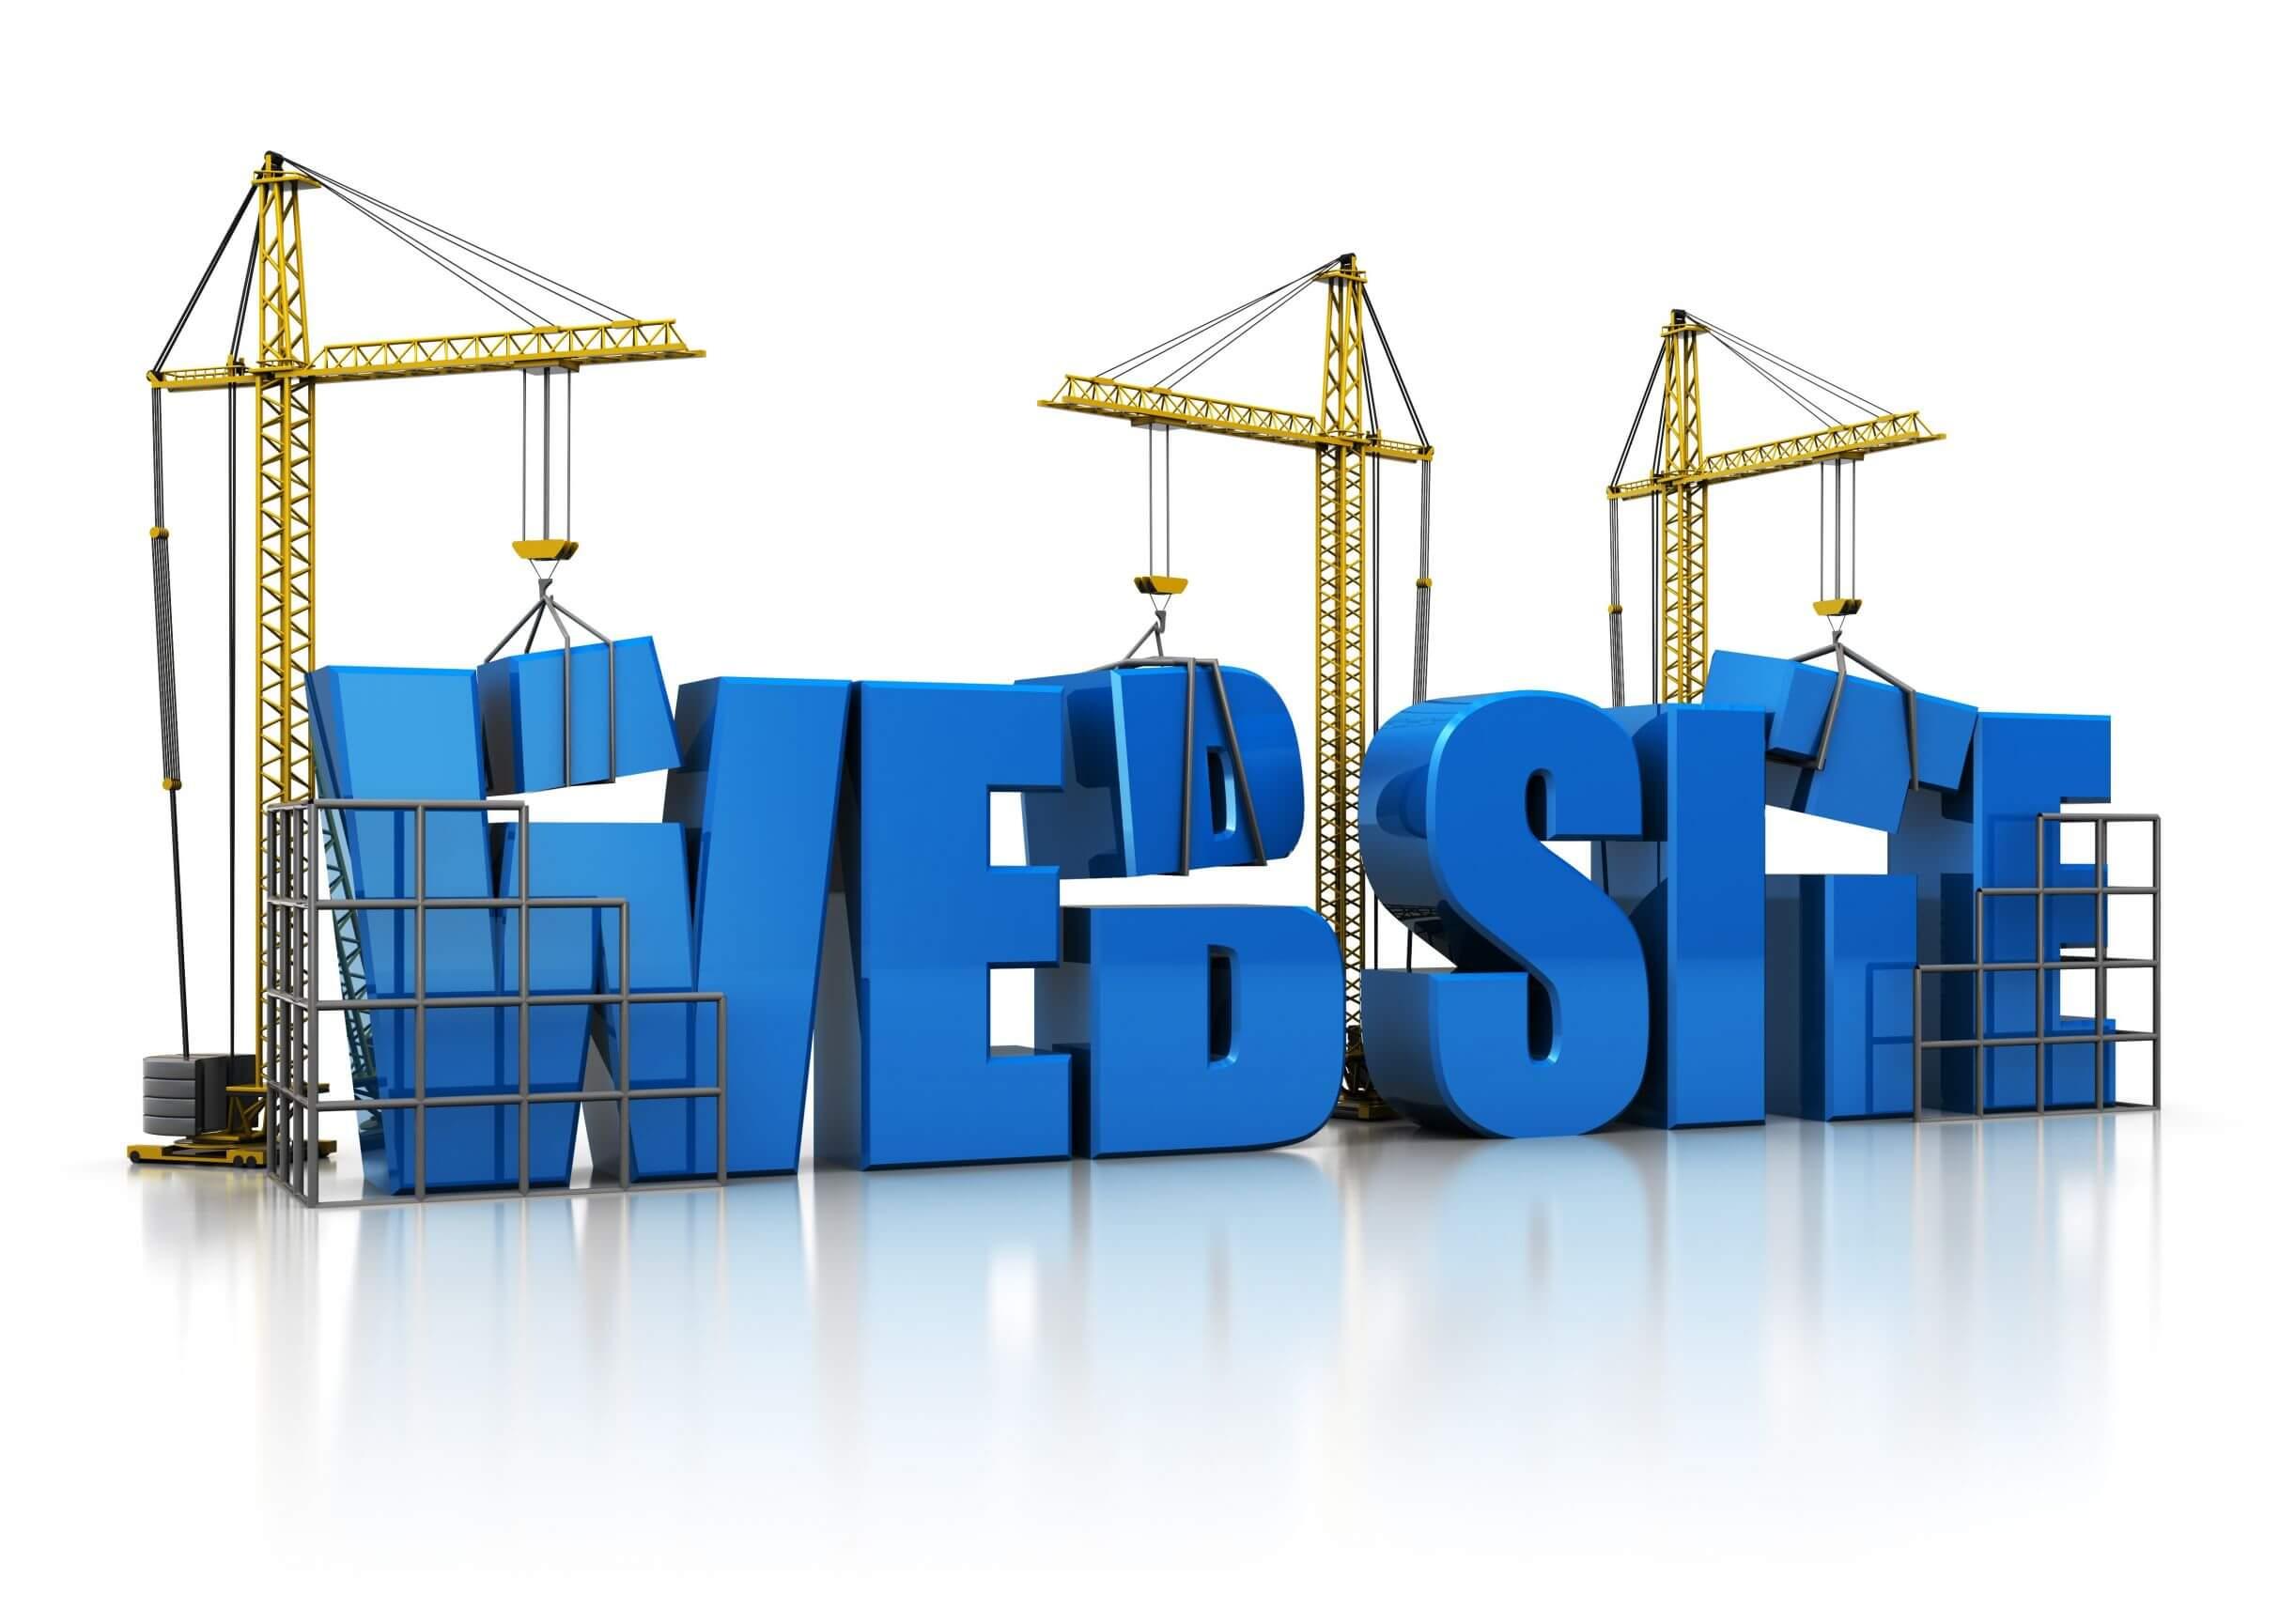 Freelance build Websites for other people